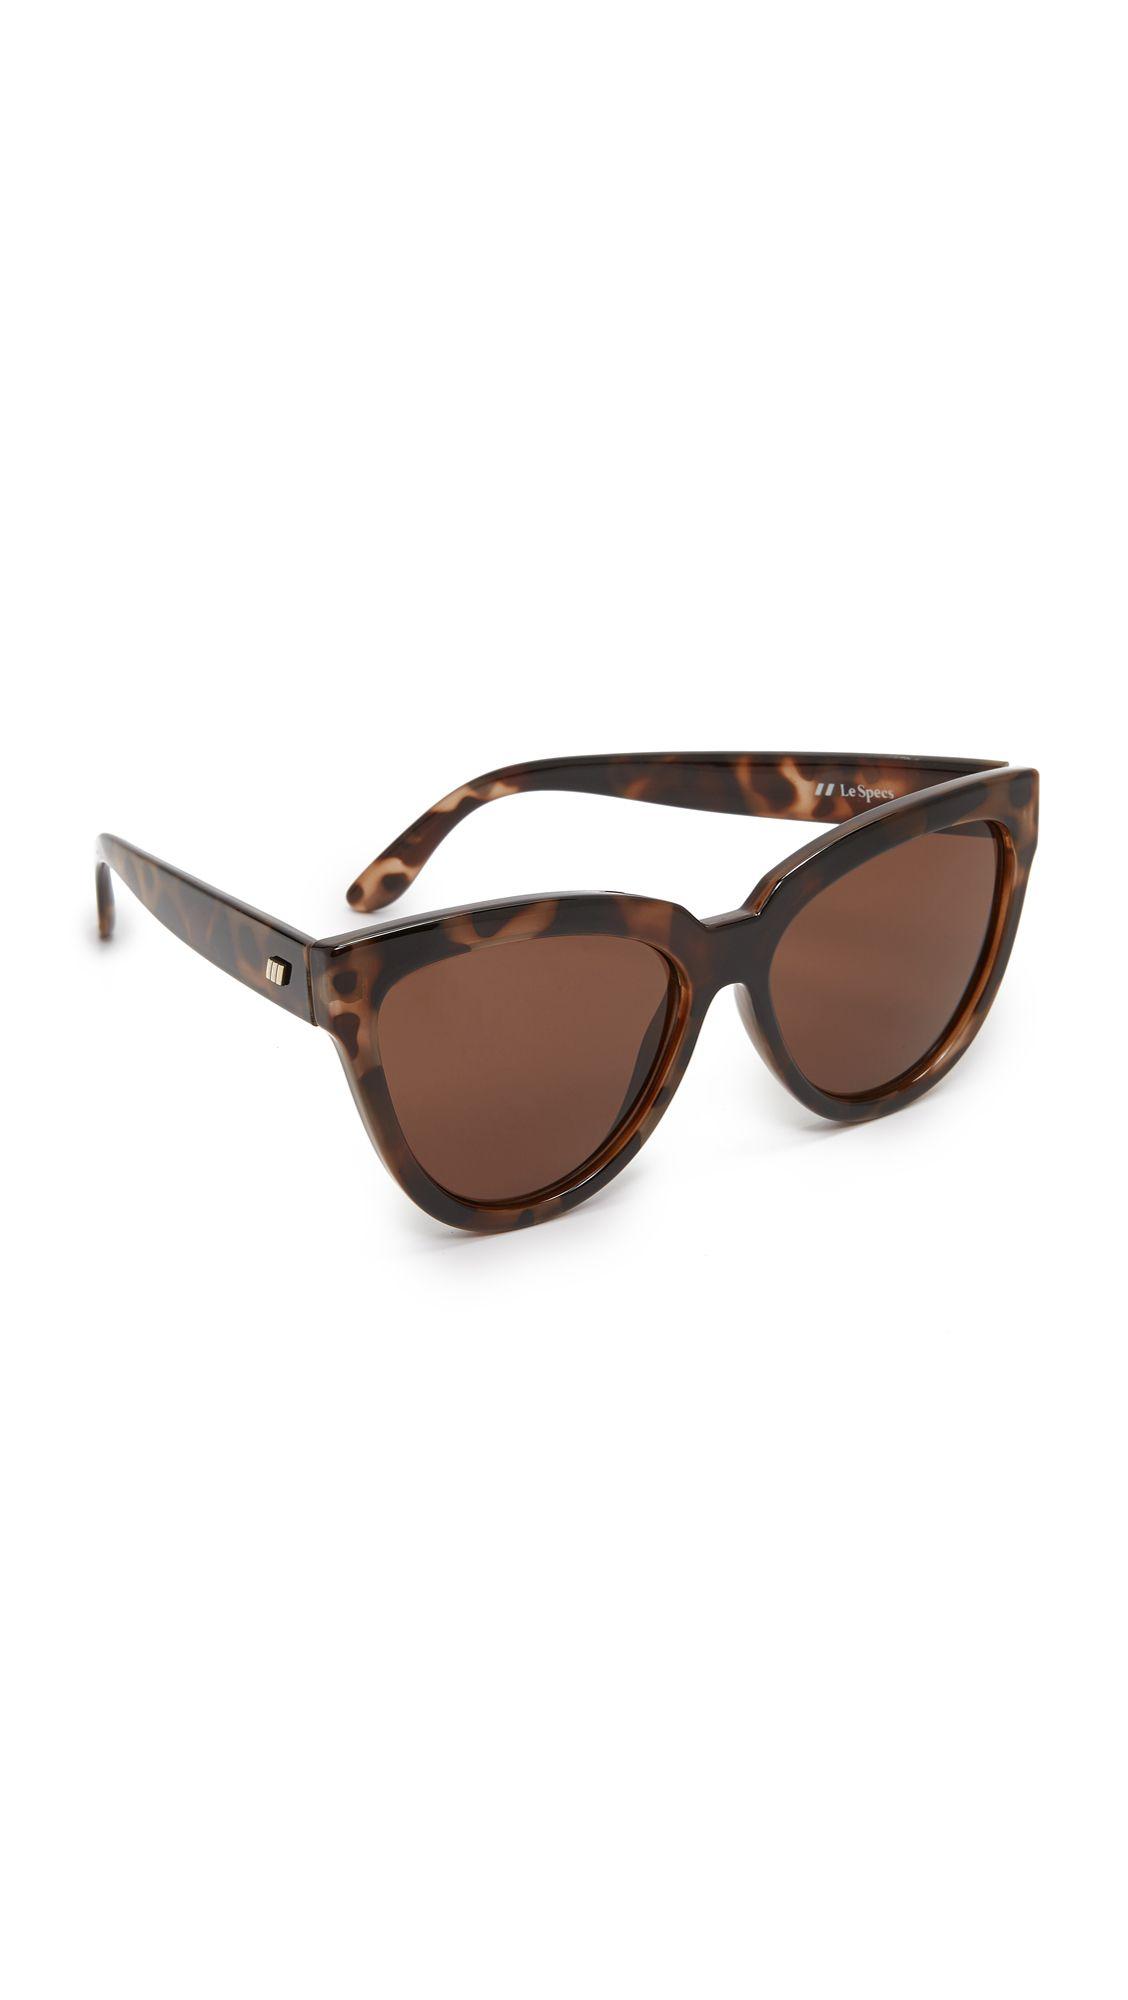 d71fdf3484 Le Specs Liar Liar Sunglasses